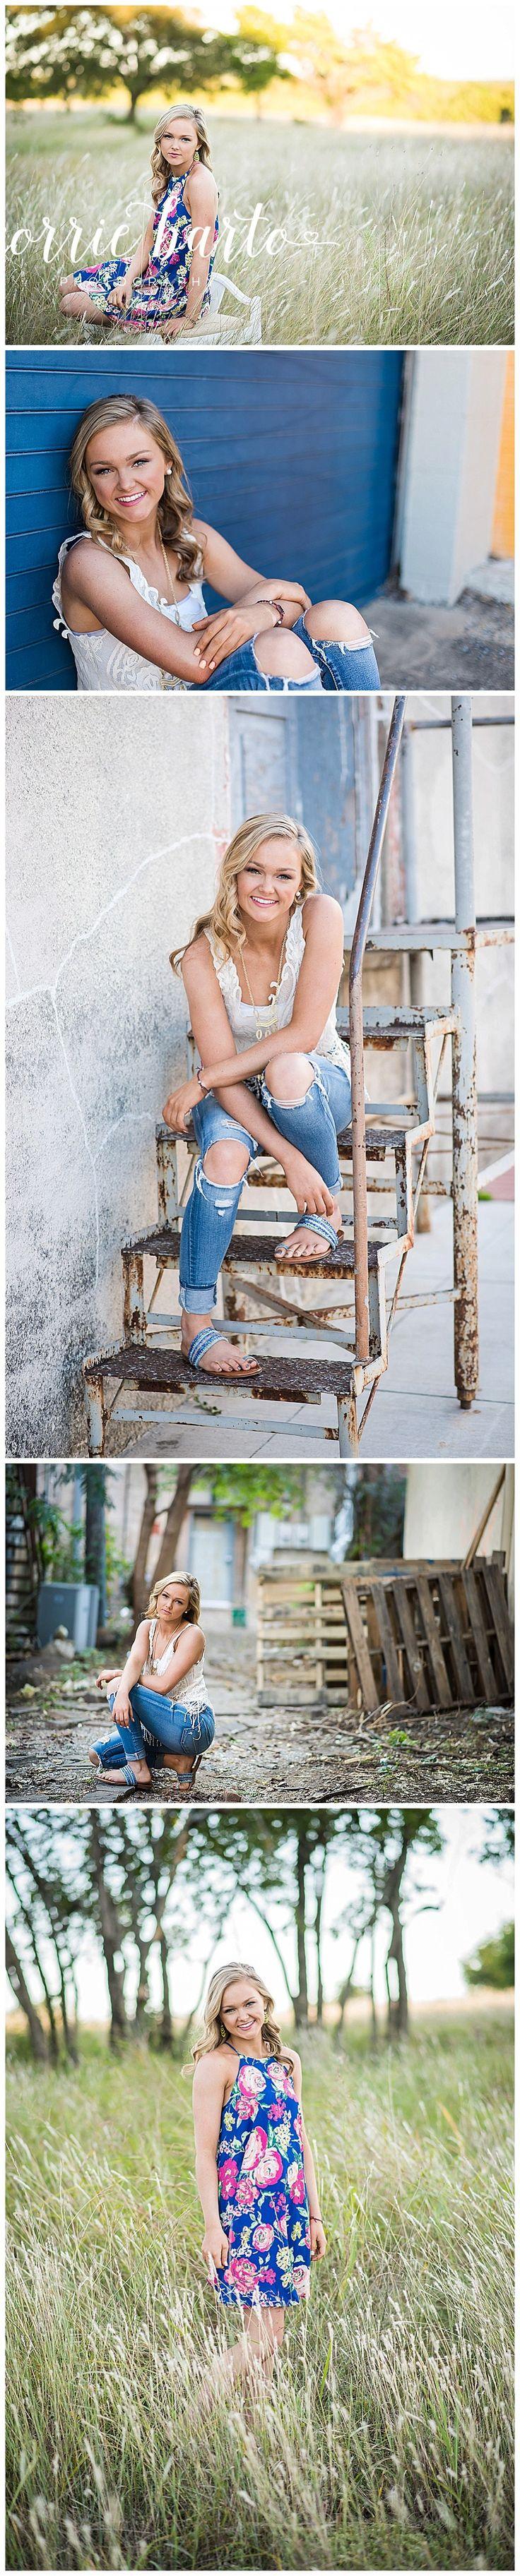 Corrie Barto Photography - senior girl pose - senior pictures - senior picture ideas for girls - senior portraits - frisco senior photographer - mckinney senior photographer - allen senior photographer - dallas senior portraits - urban senior session - city senior pictures